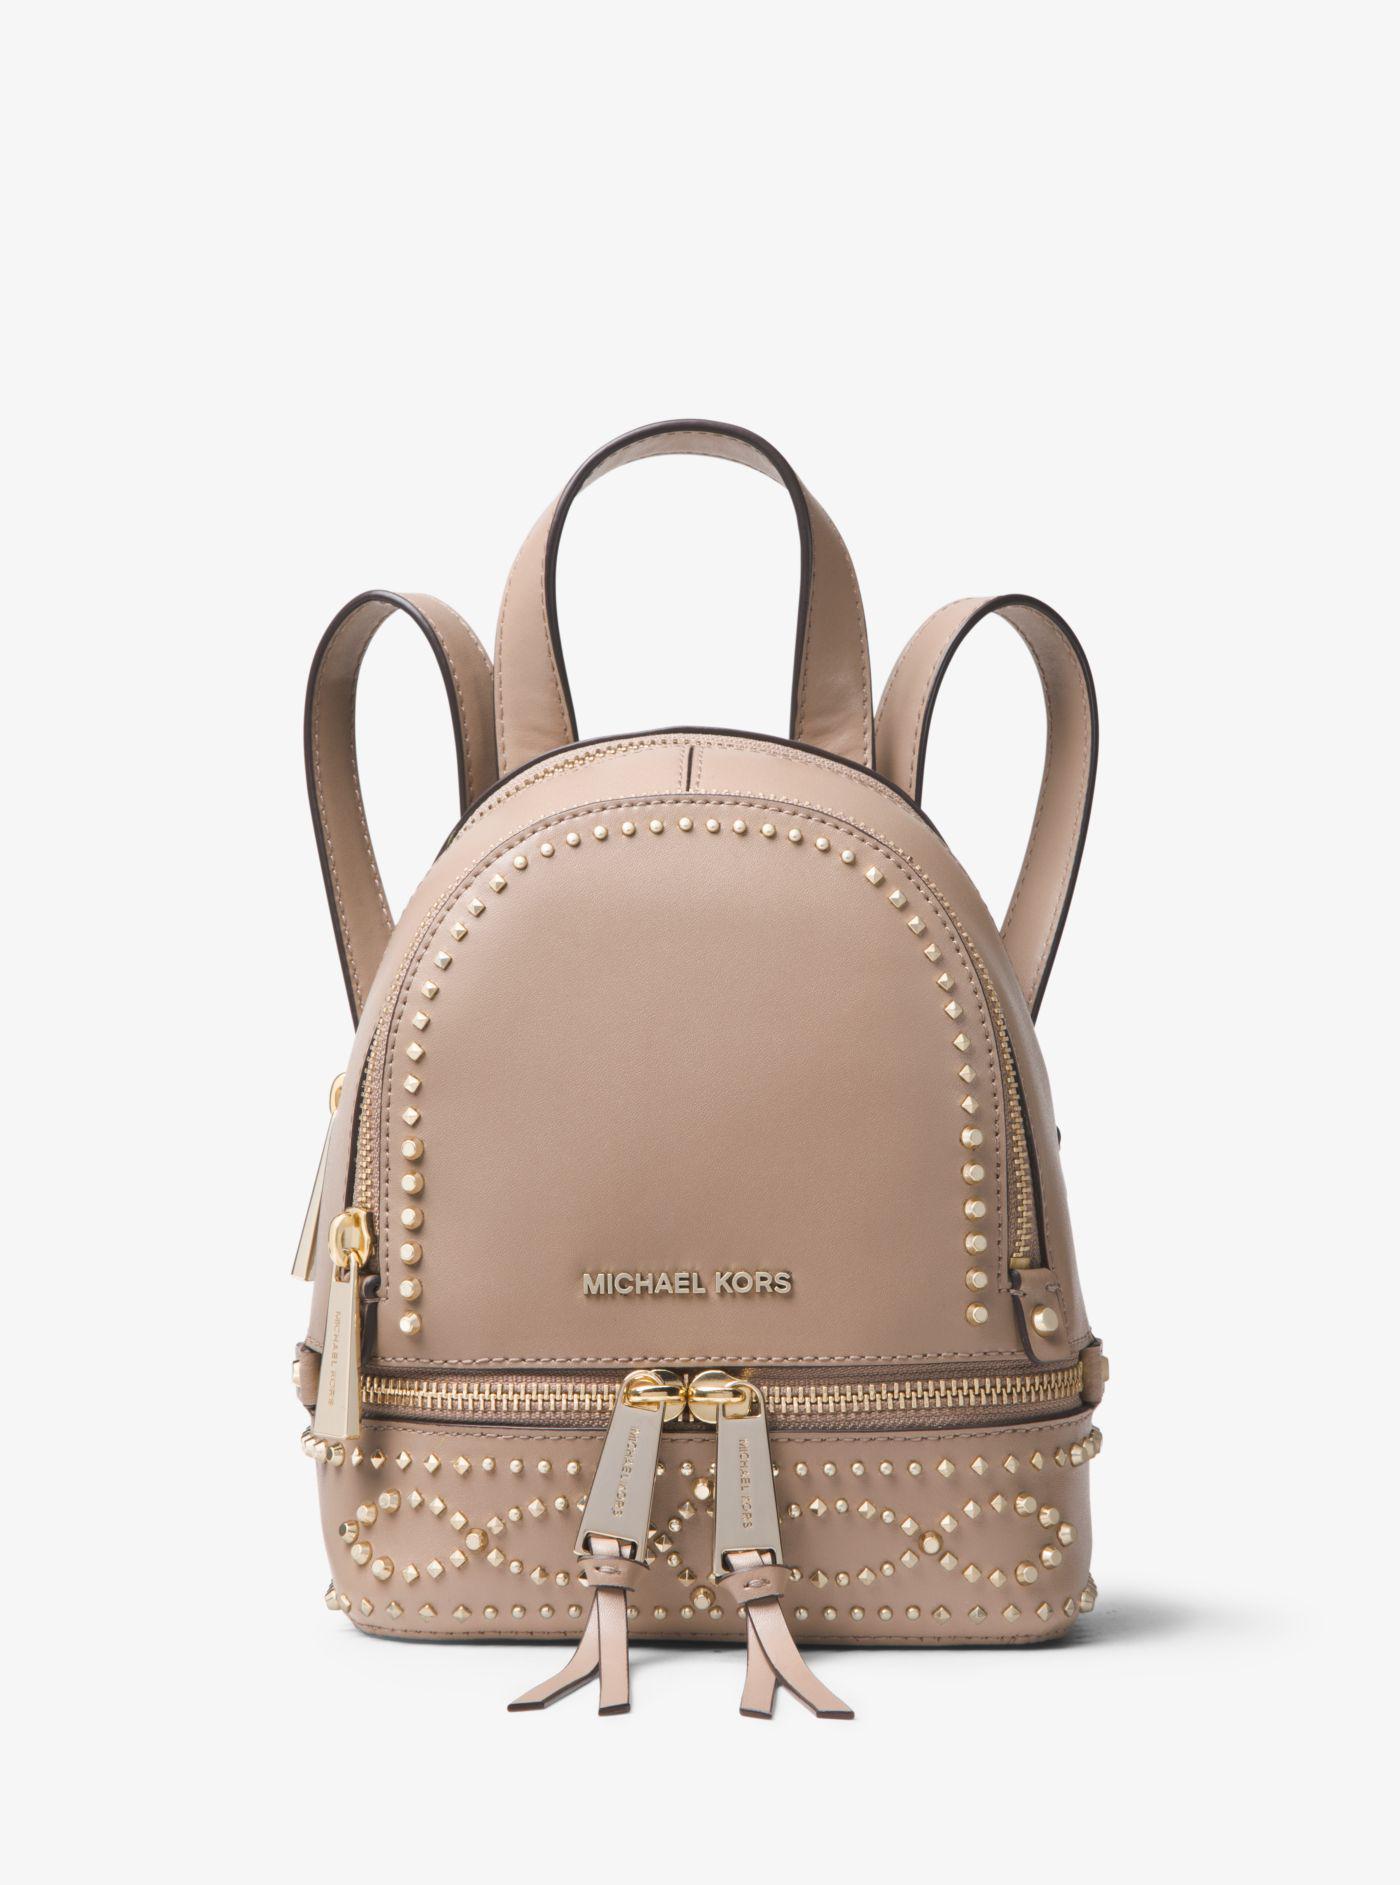 0127f4bb367e ... reduced michael kors multicolor rhea mini studded leather backpack lyst.  view fullscreen 4ec84 72d57 ...